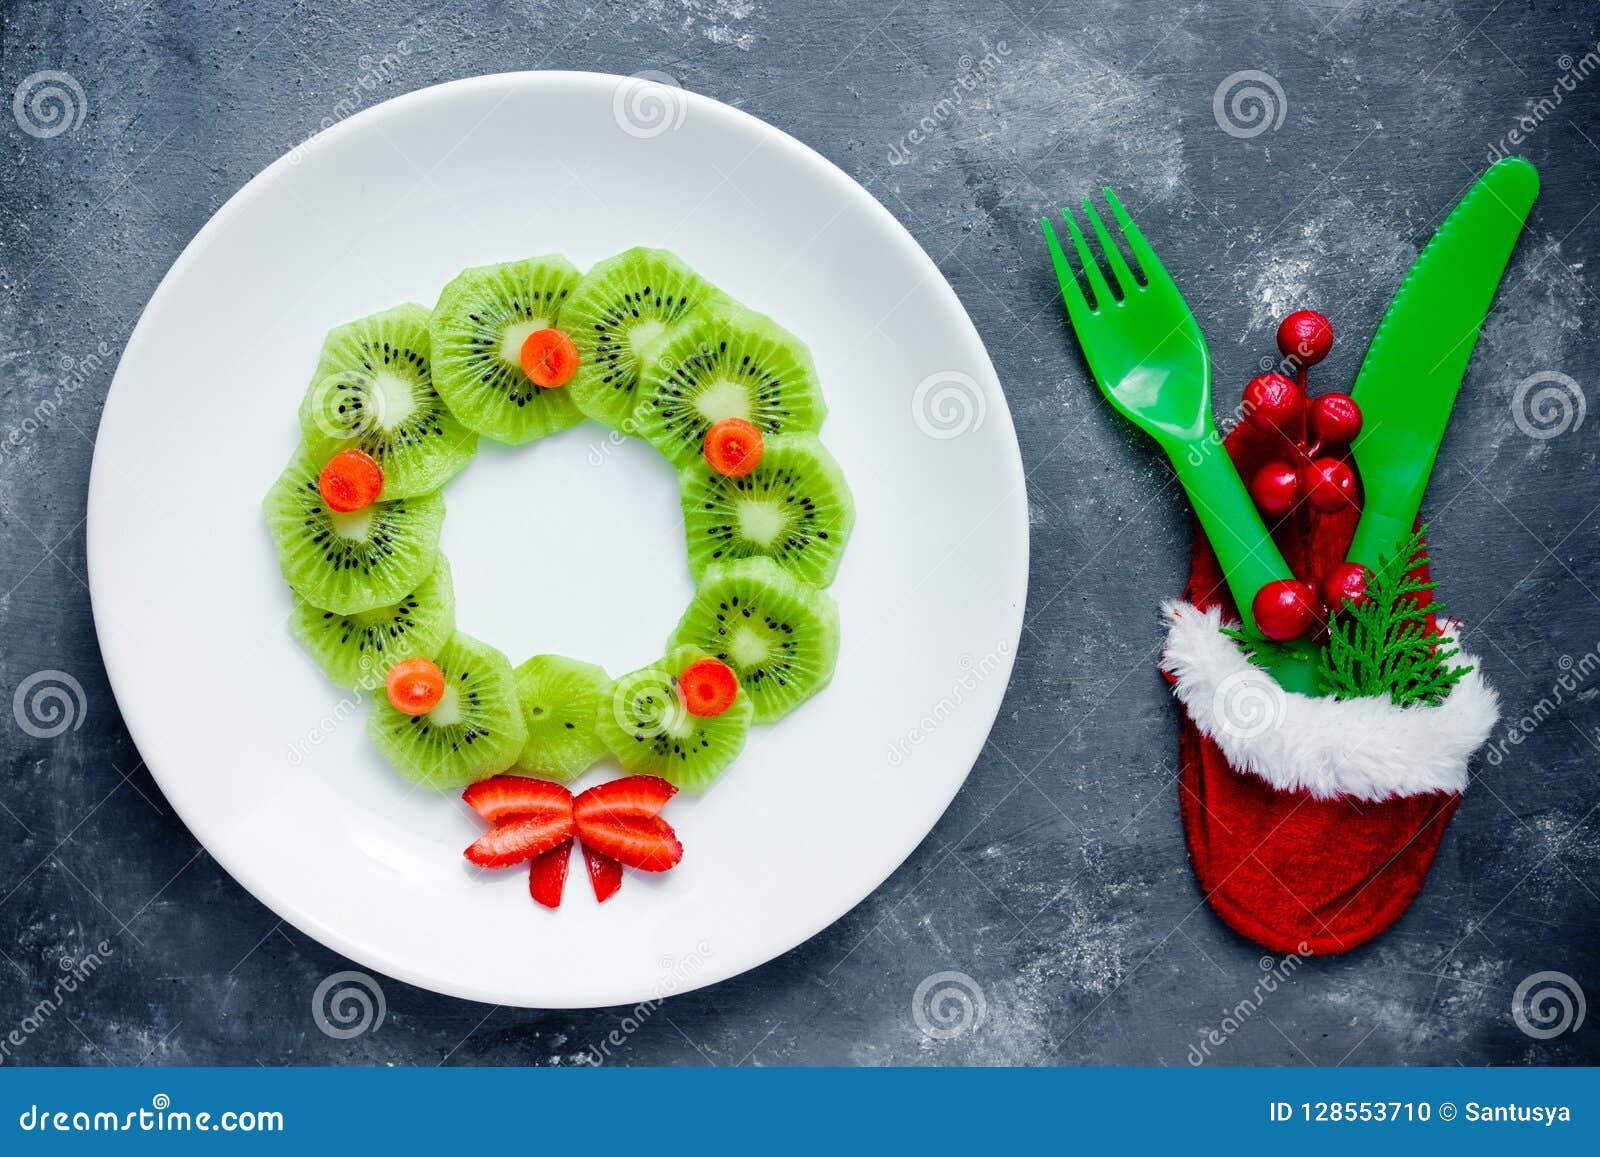 Christmas Wreath Kiwi Strawberry Fruit Plate Stock Photo Image Of Meal Dessert 128553710